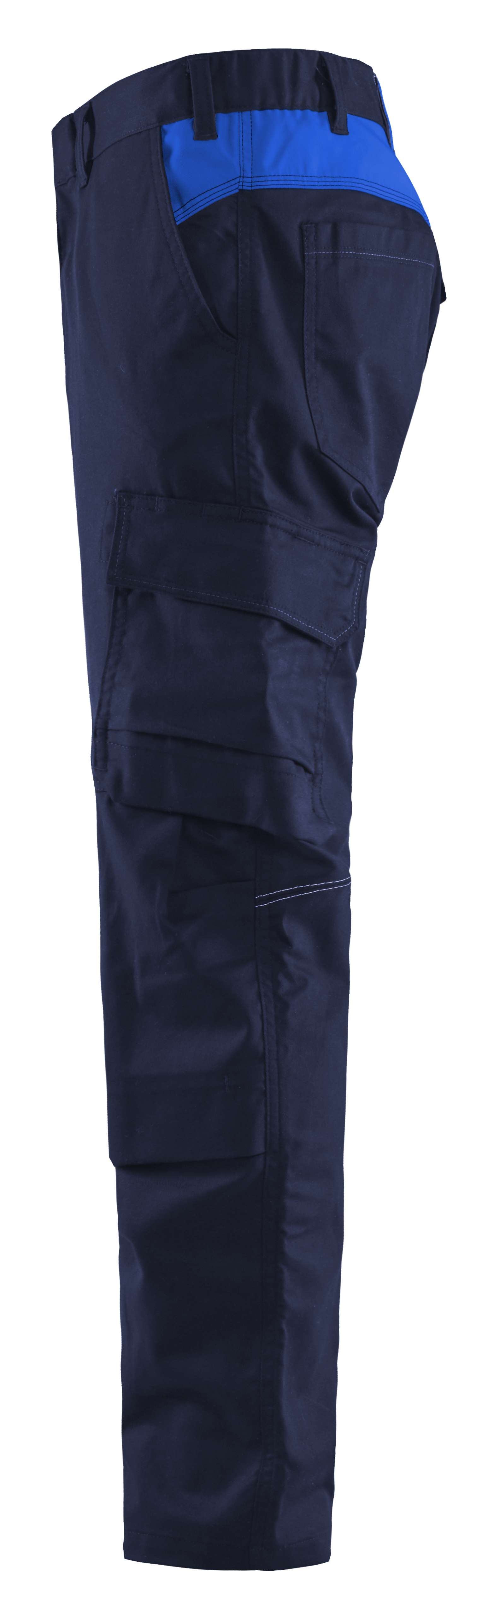 Blaklader Broeken 14481832 marineblauw-korenblauw(8985)